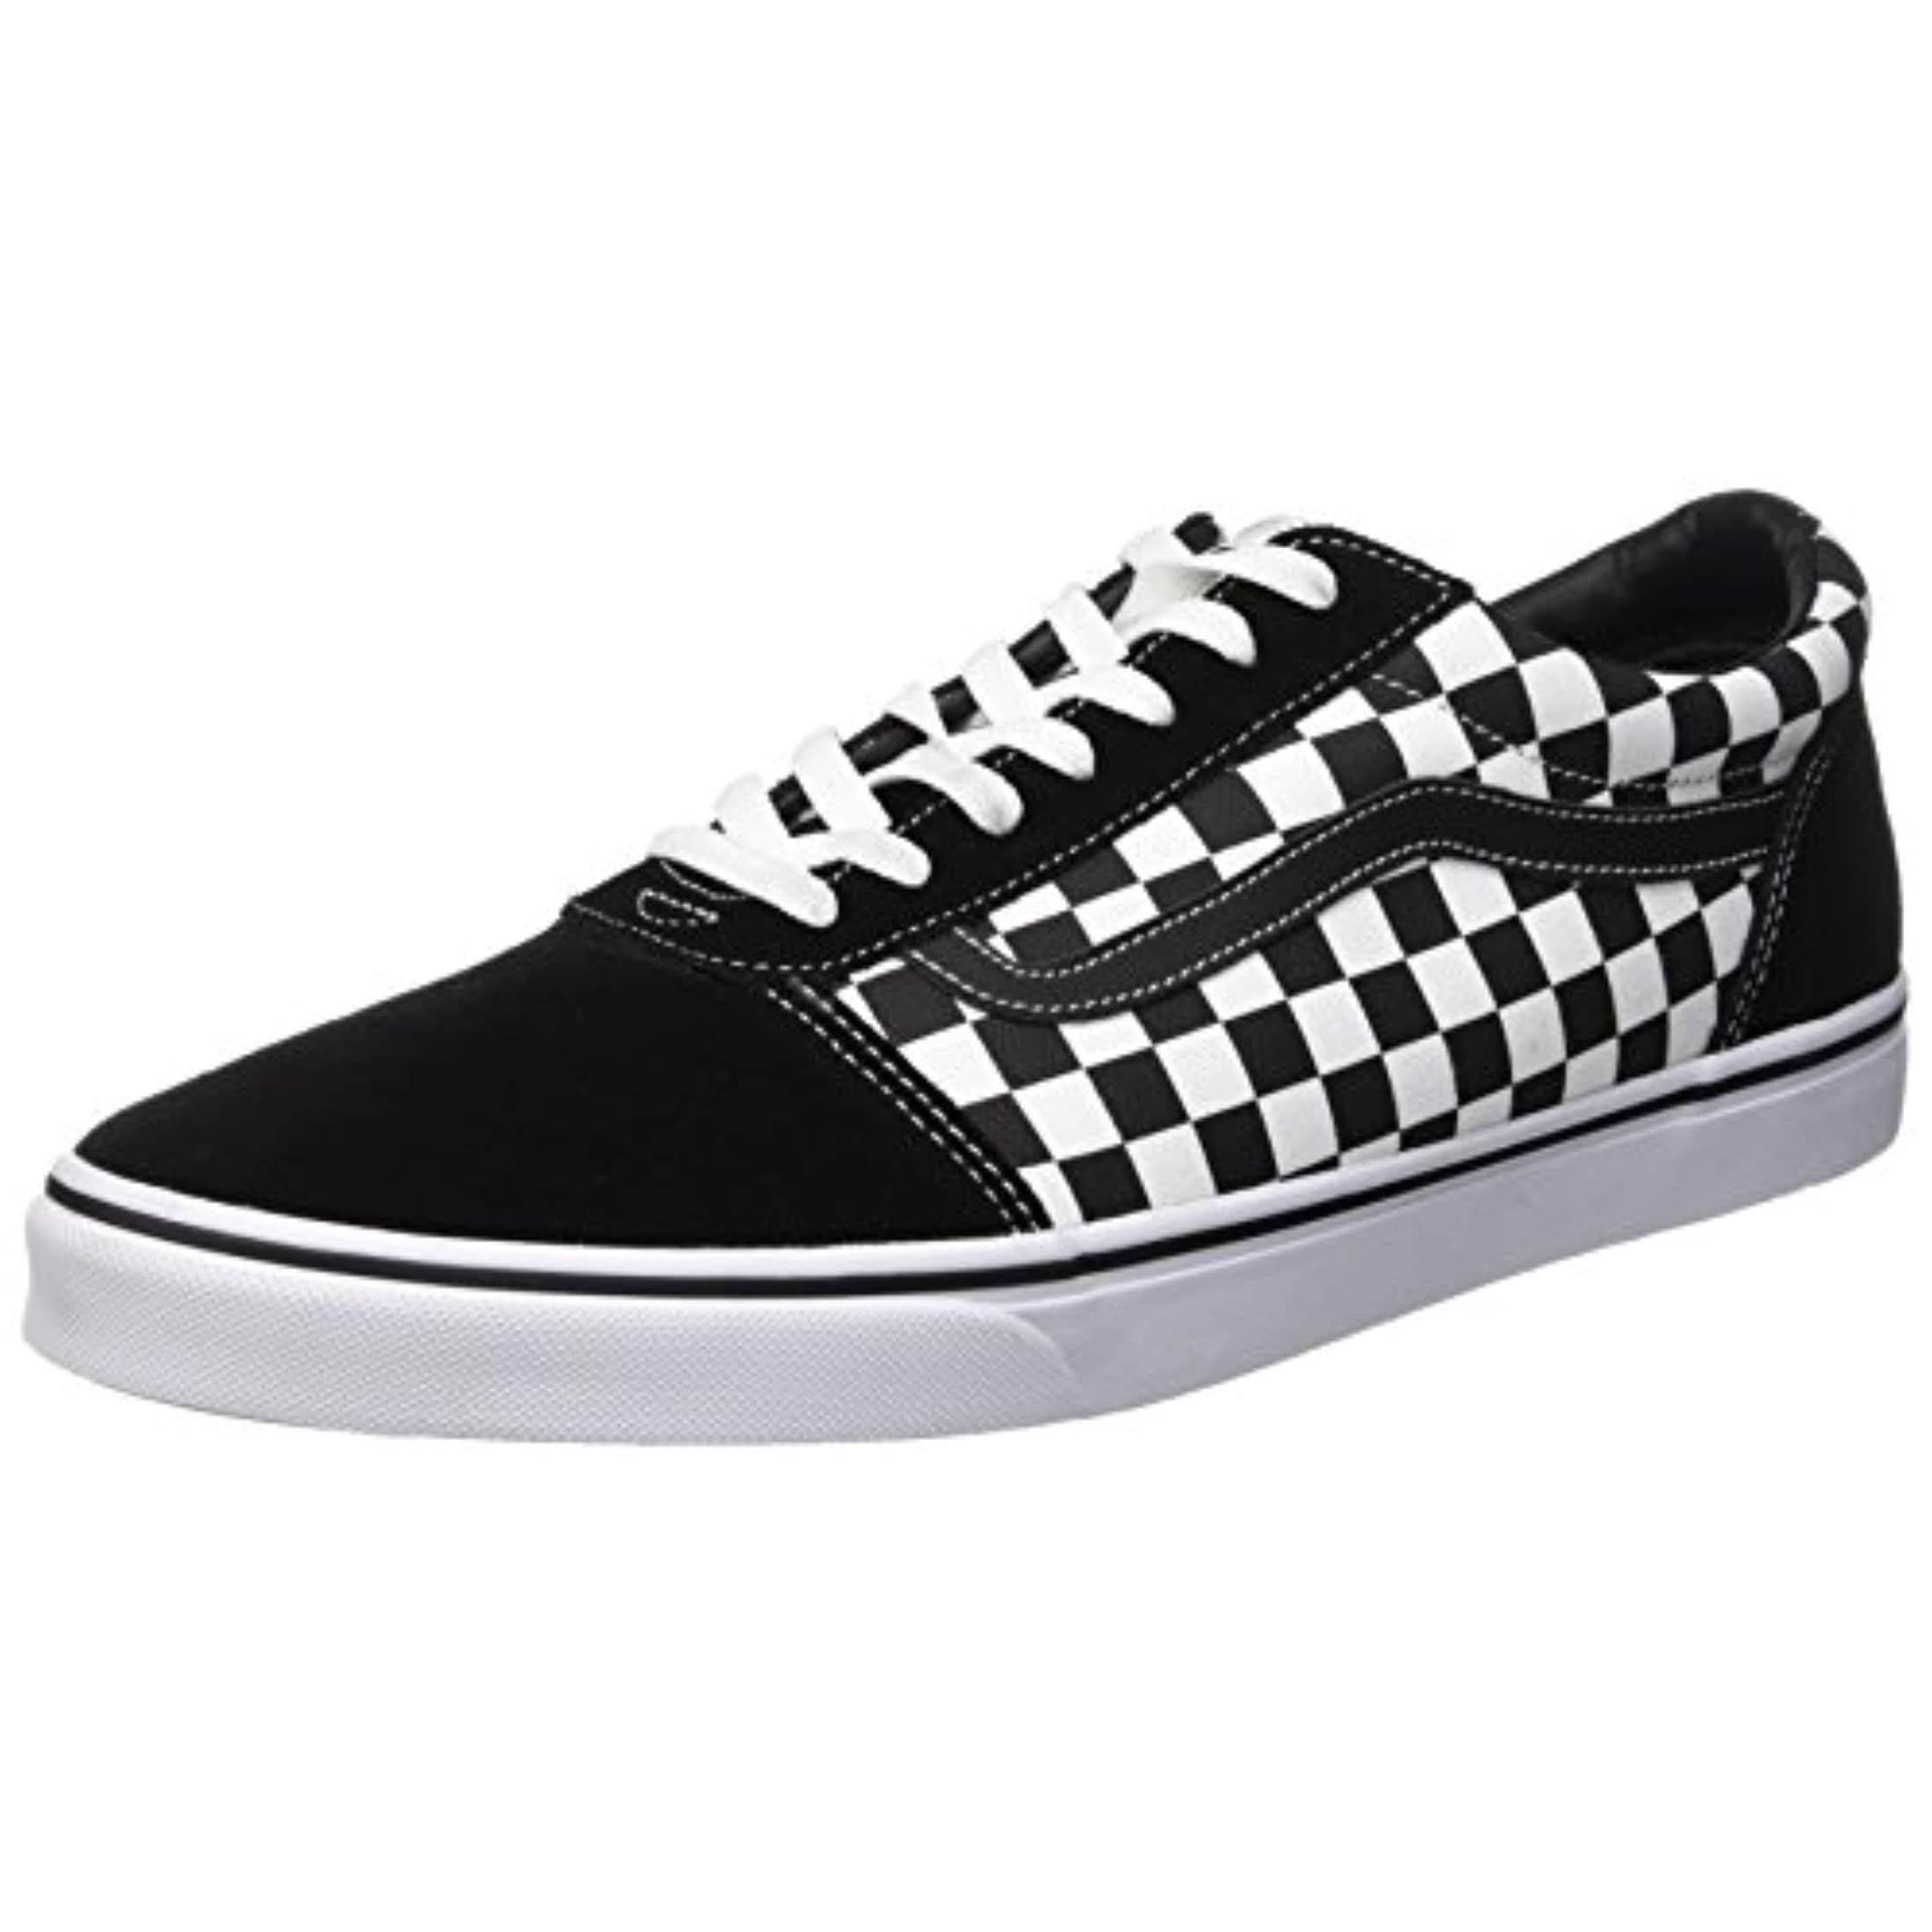 5d670b36d24a Buy Size 5 Men s Sneakers Online at Overstock